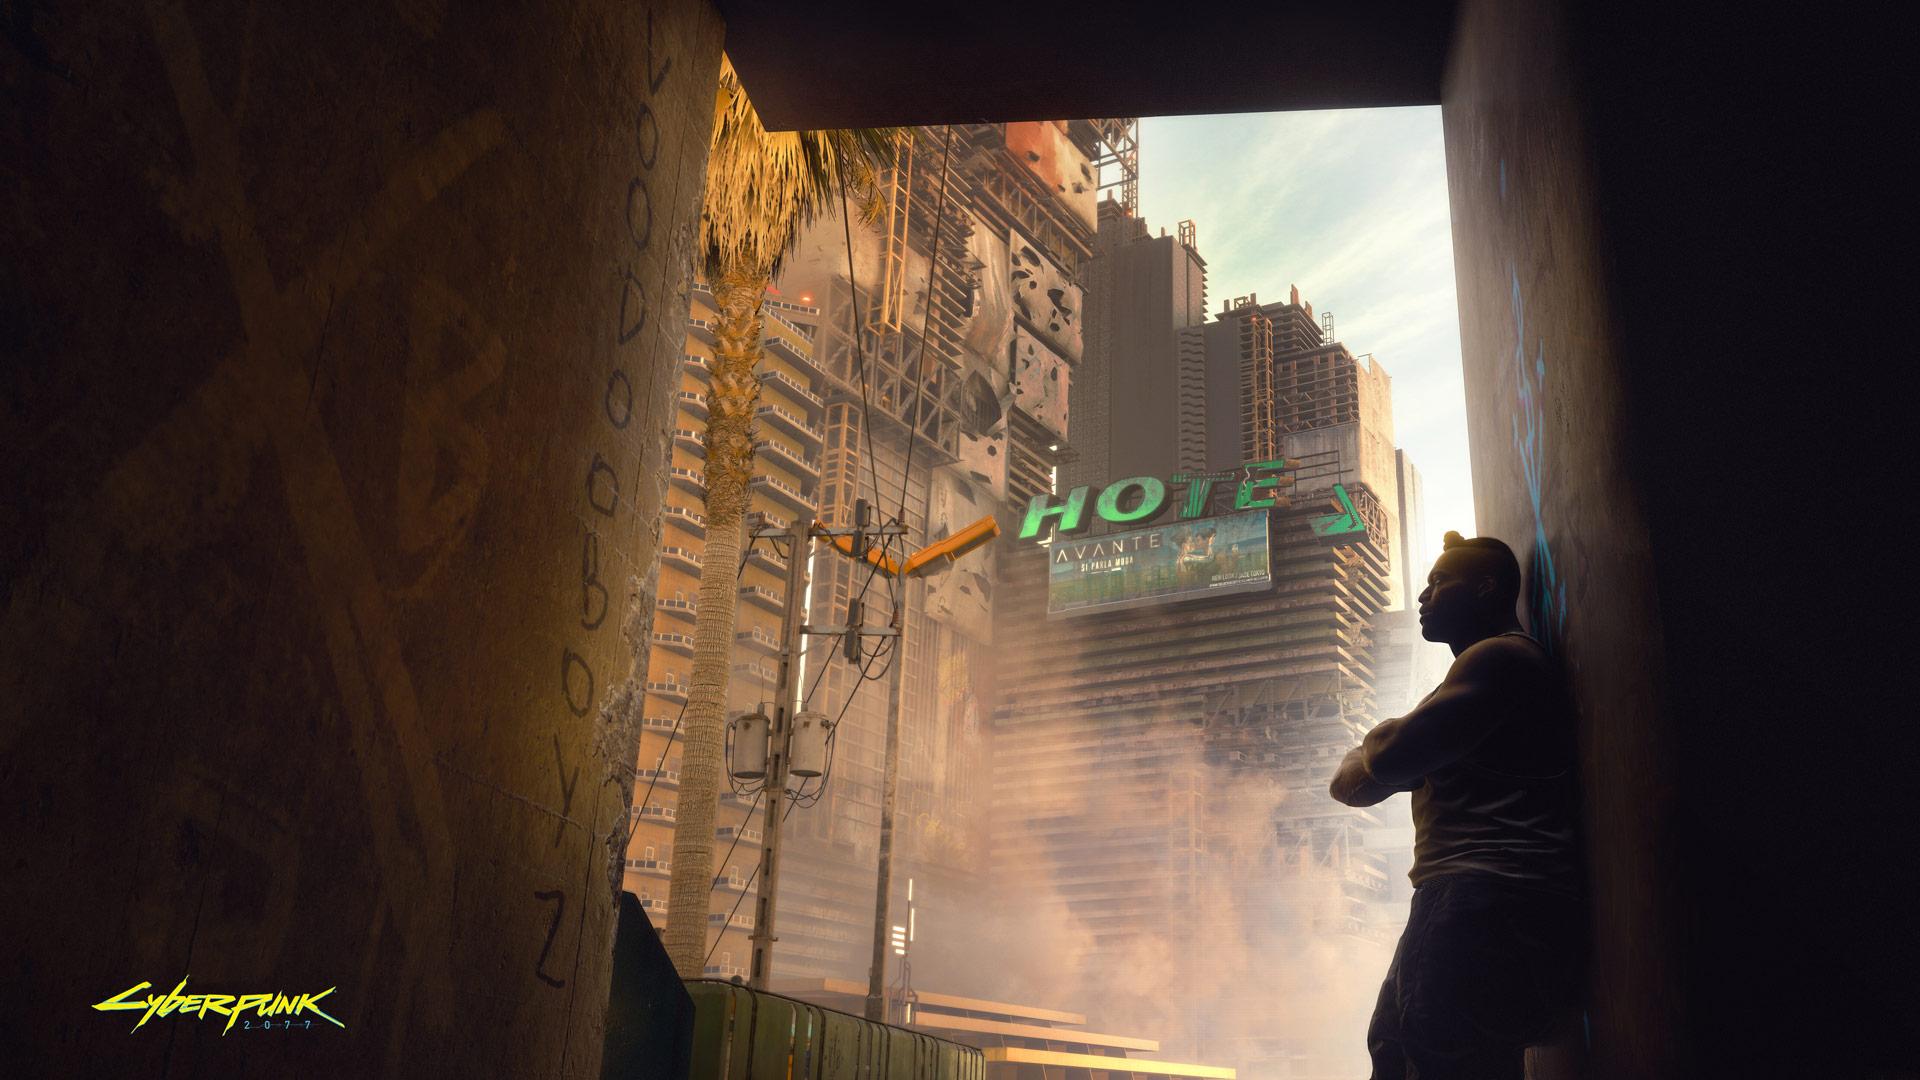 Will Cyberpunk 2077 have multiplayer?